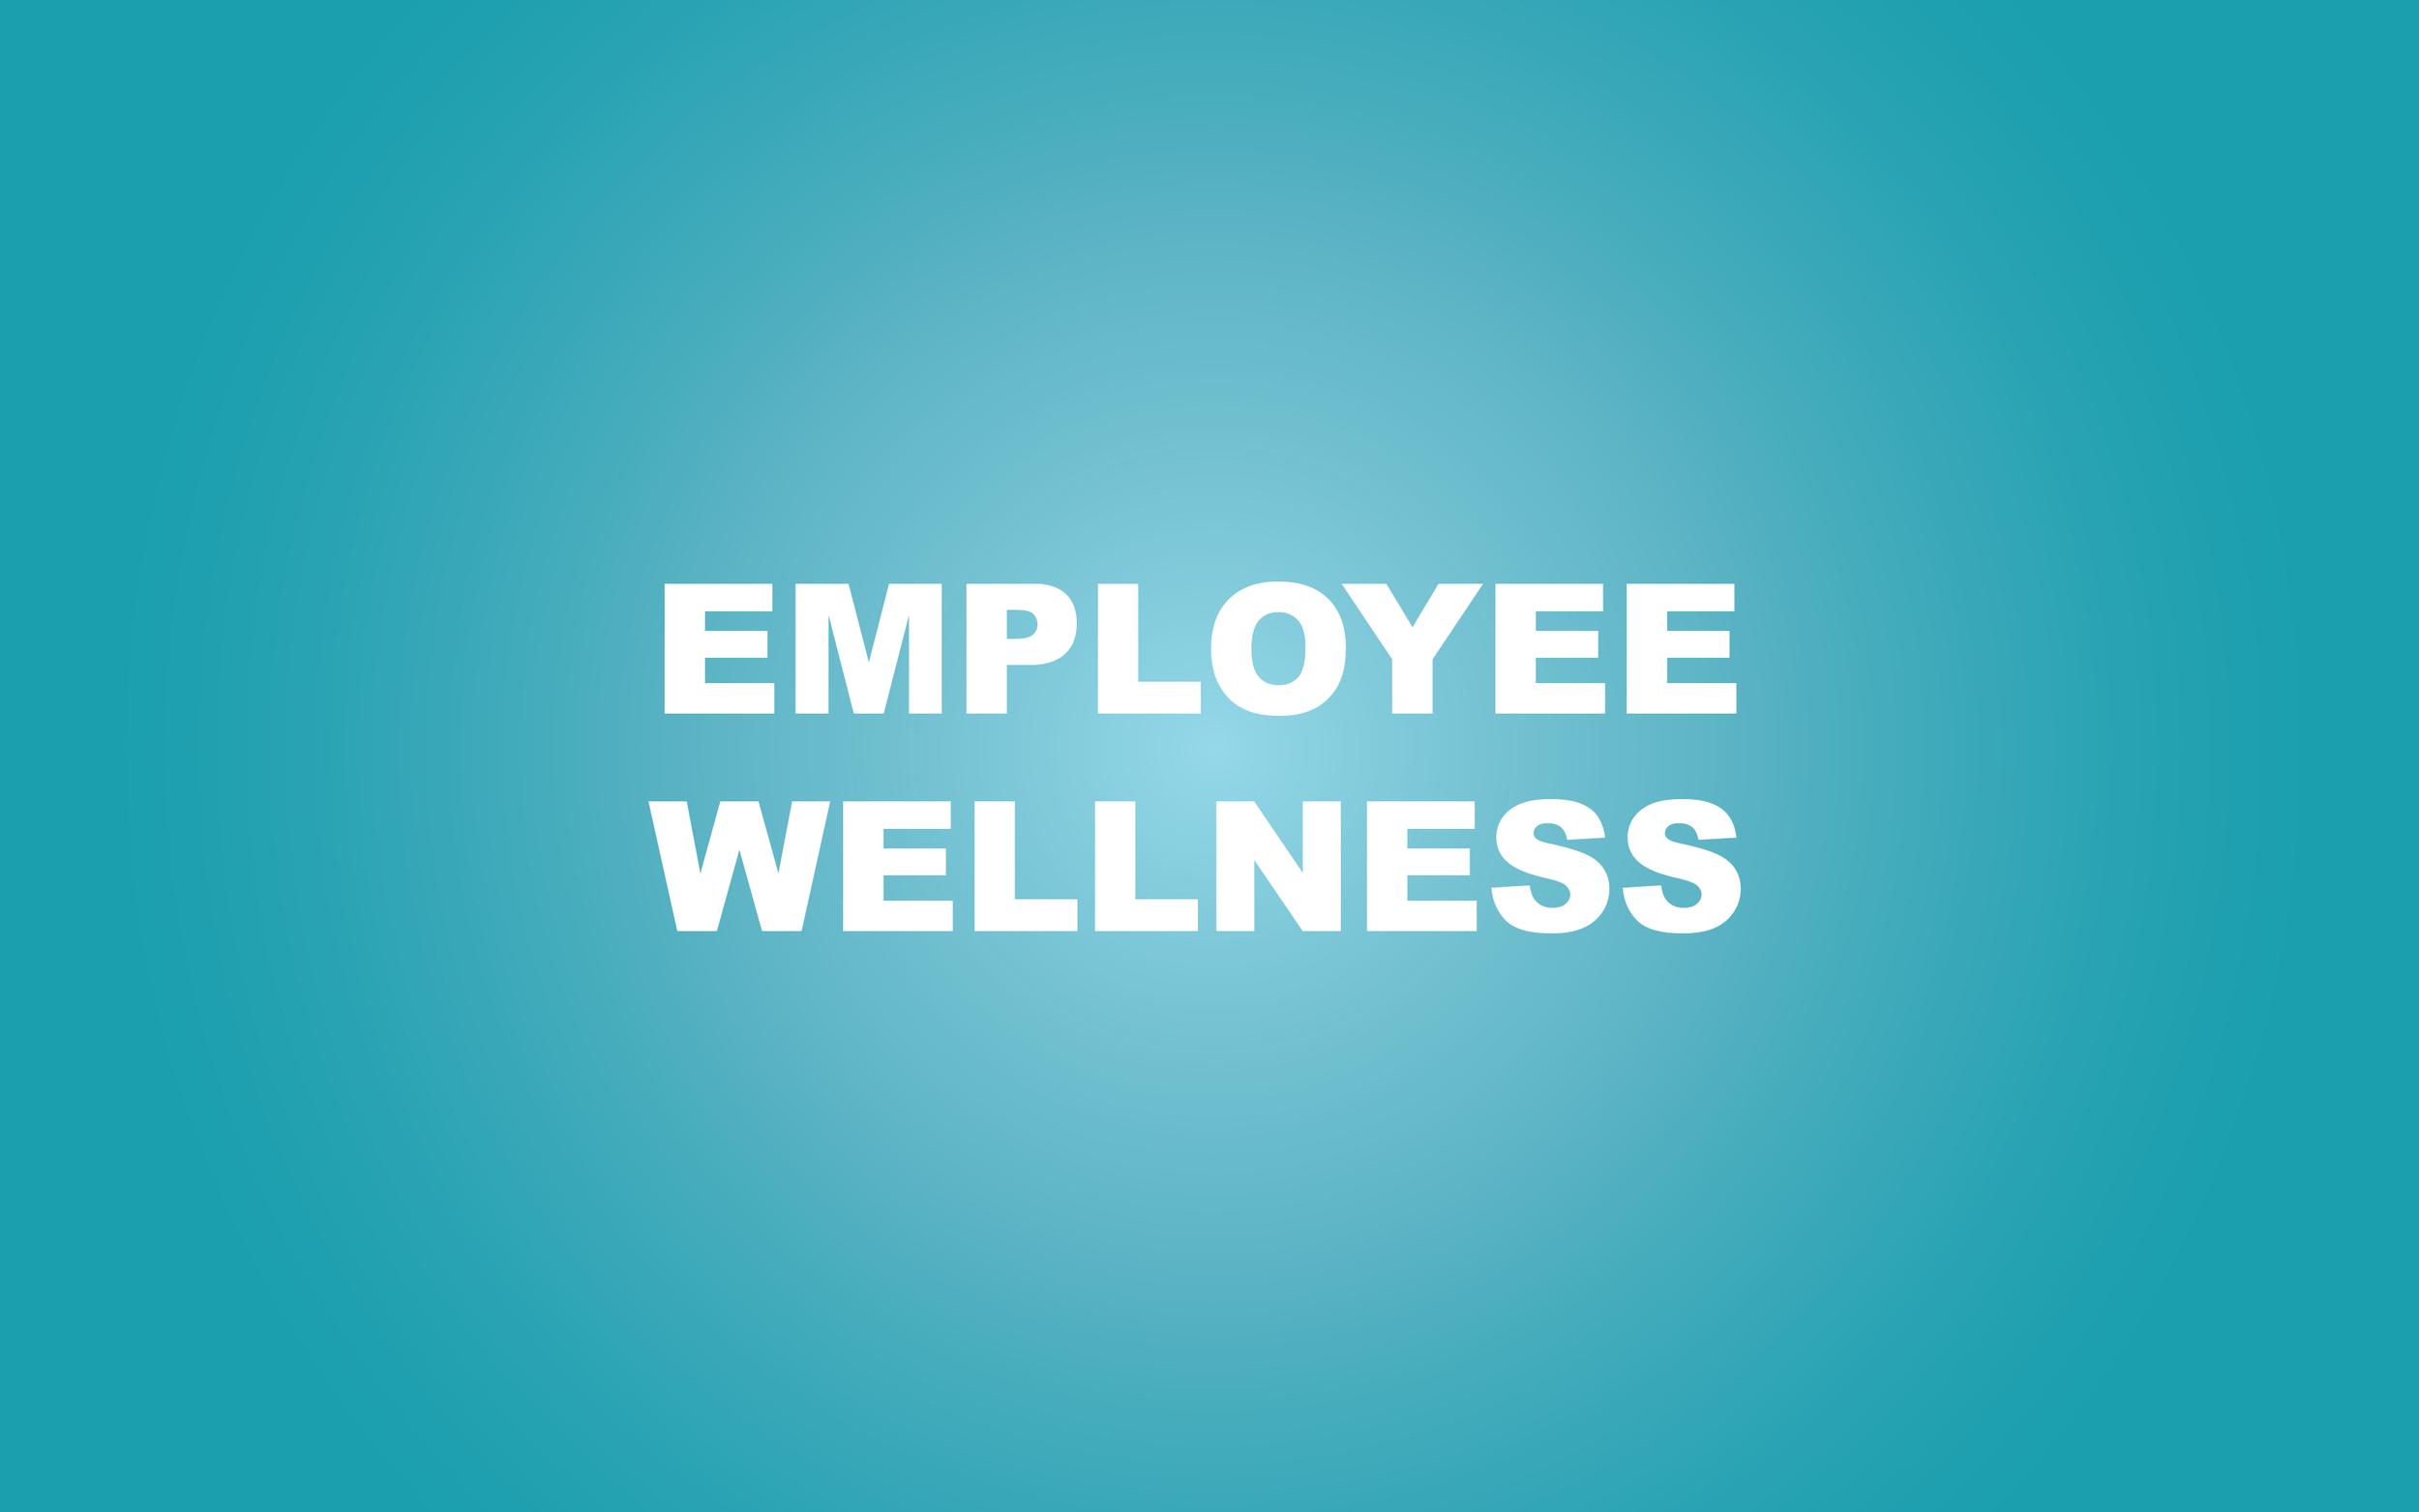 wscc_employee_wellness.png